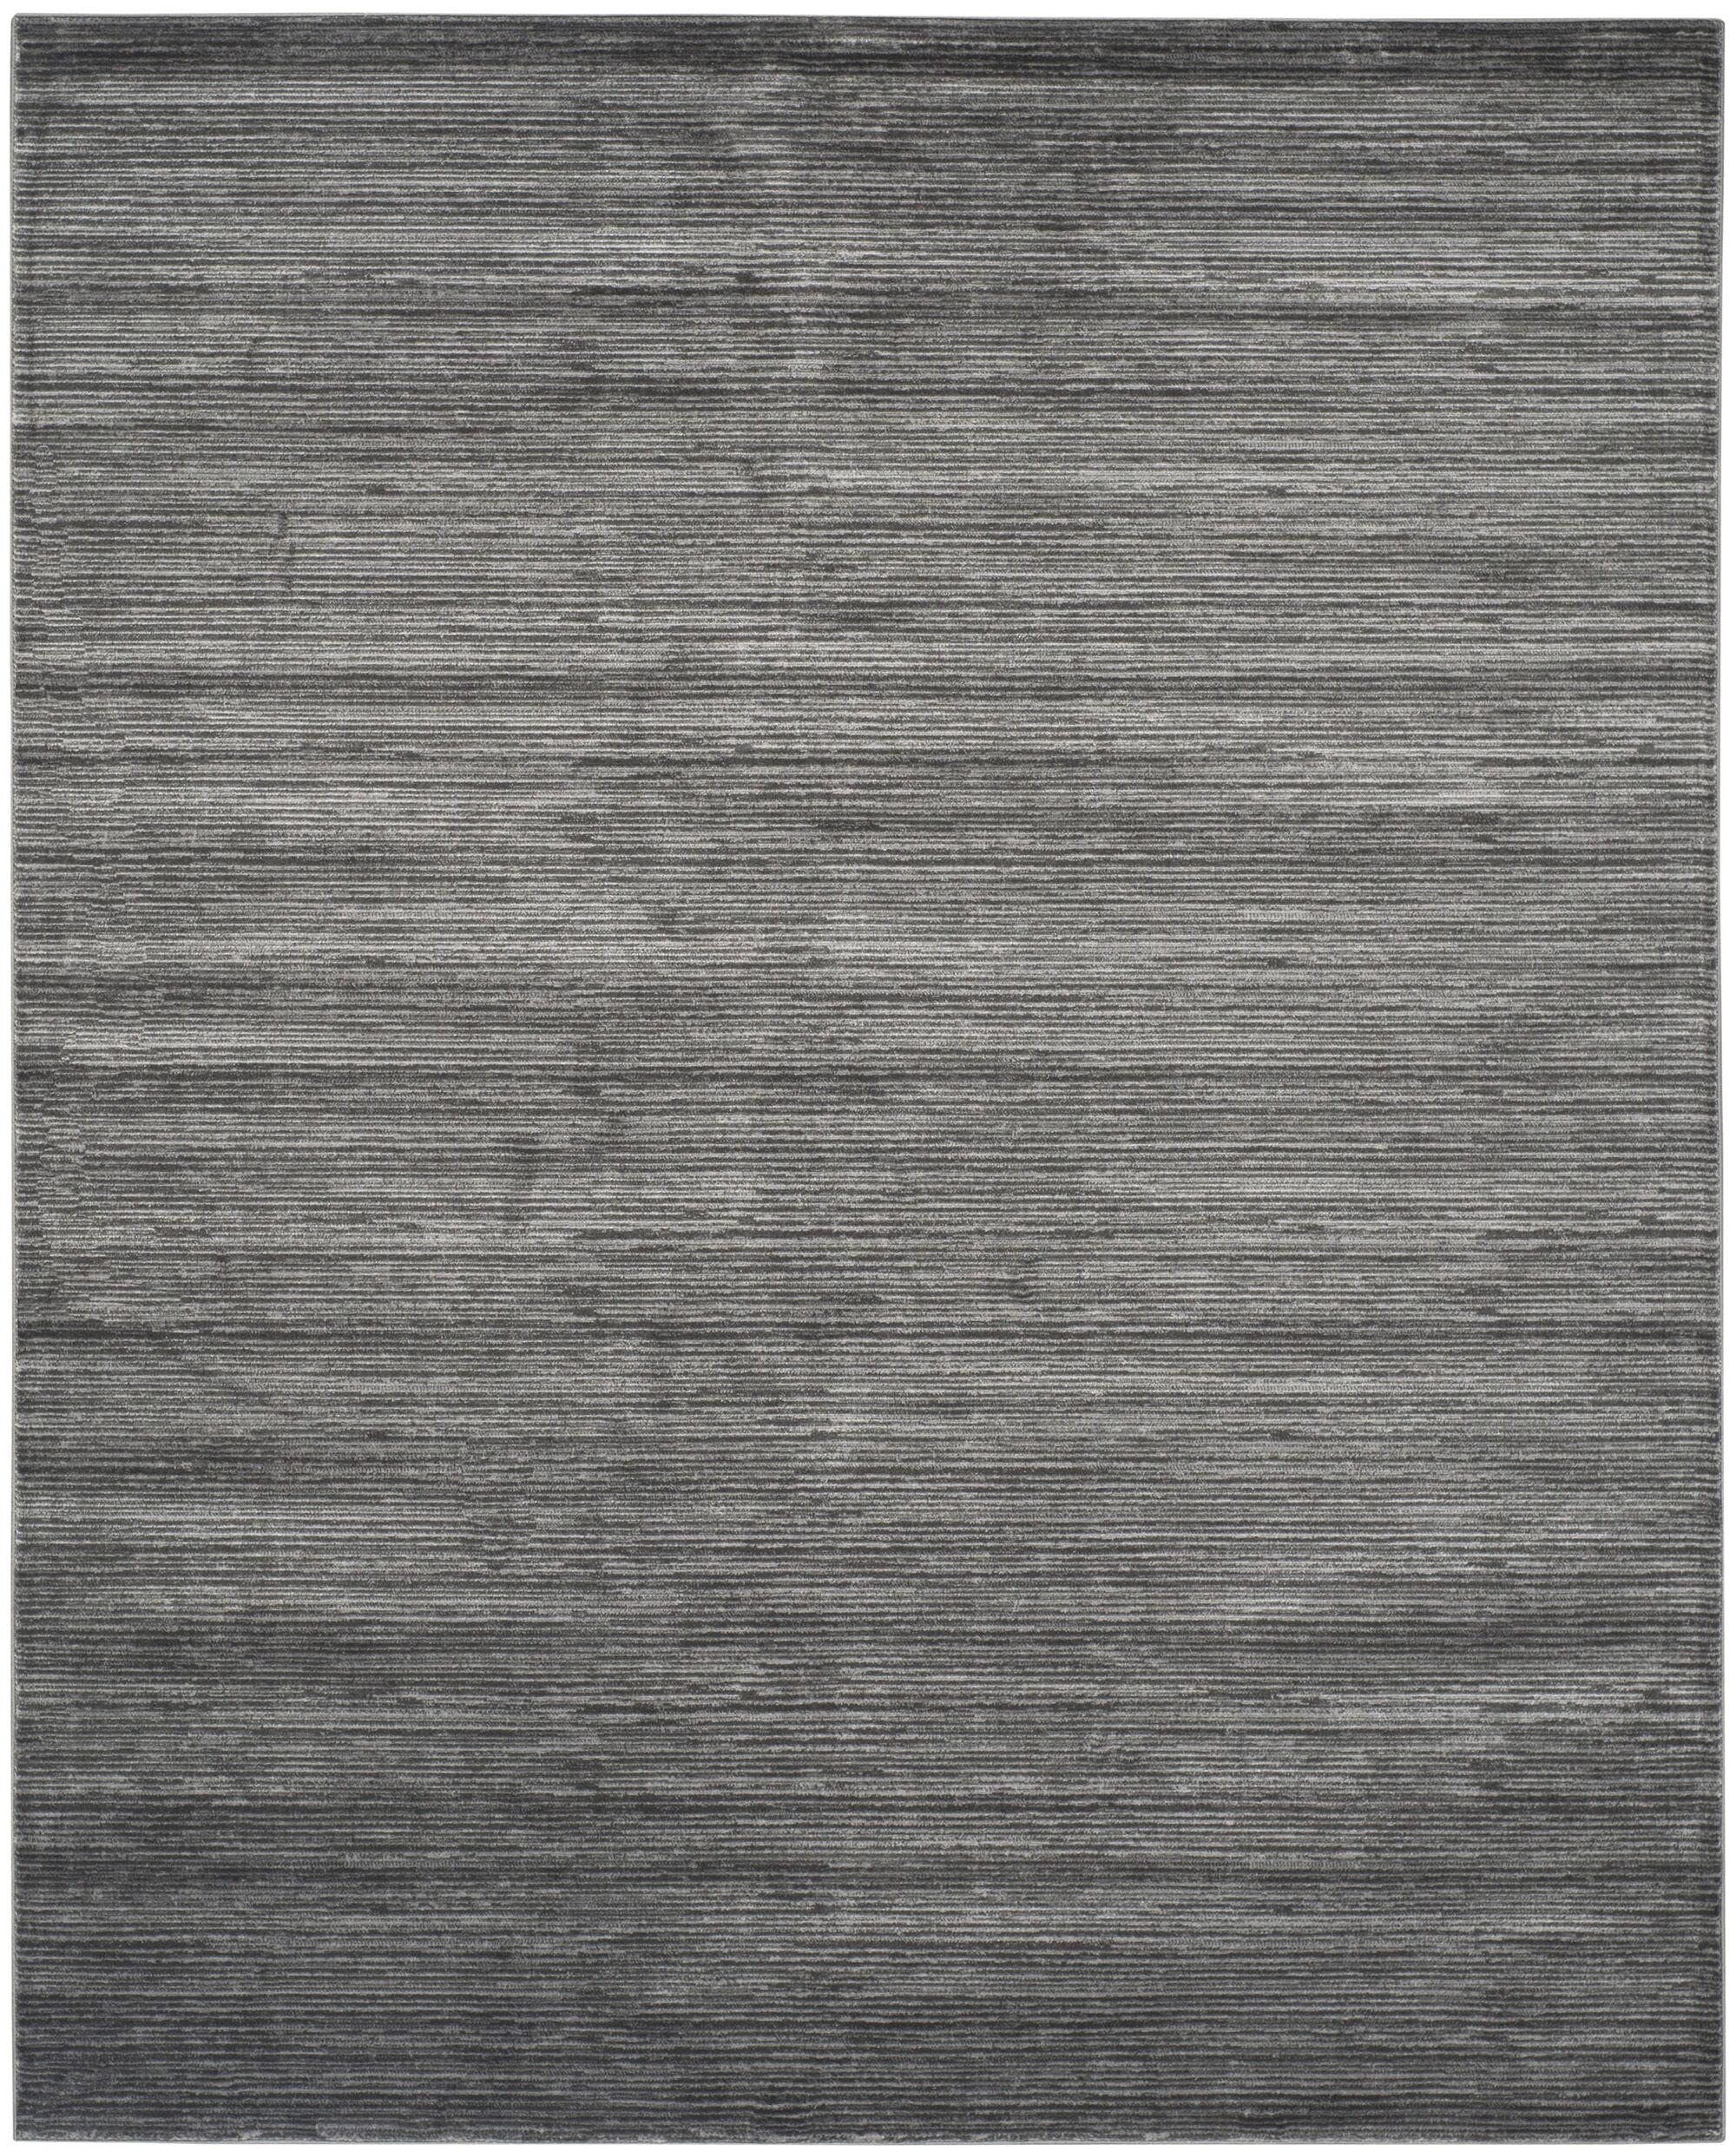 Harloe Gray Area Rug Rug Size: Rectangle 8' x 10'